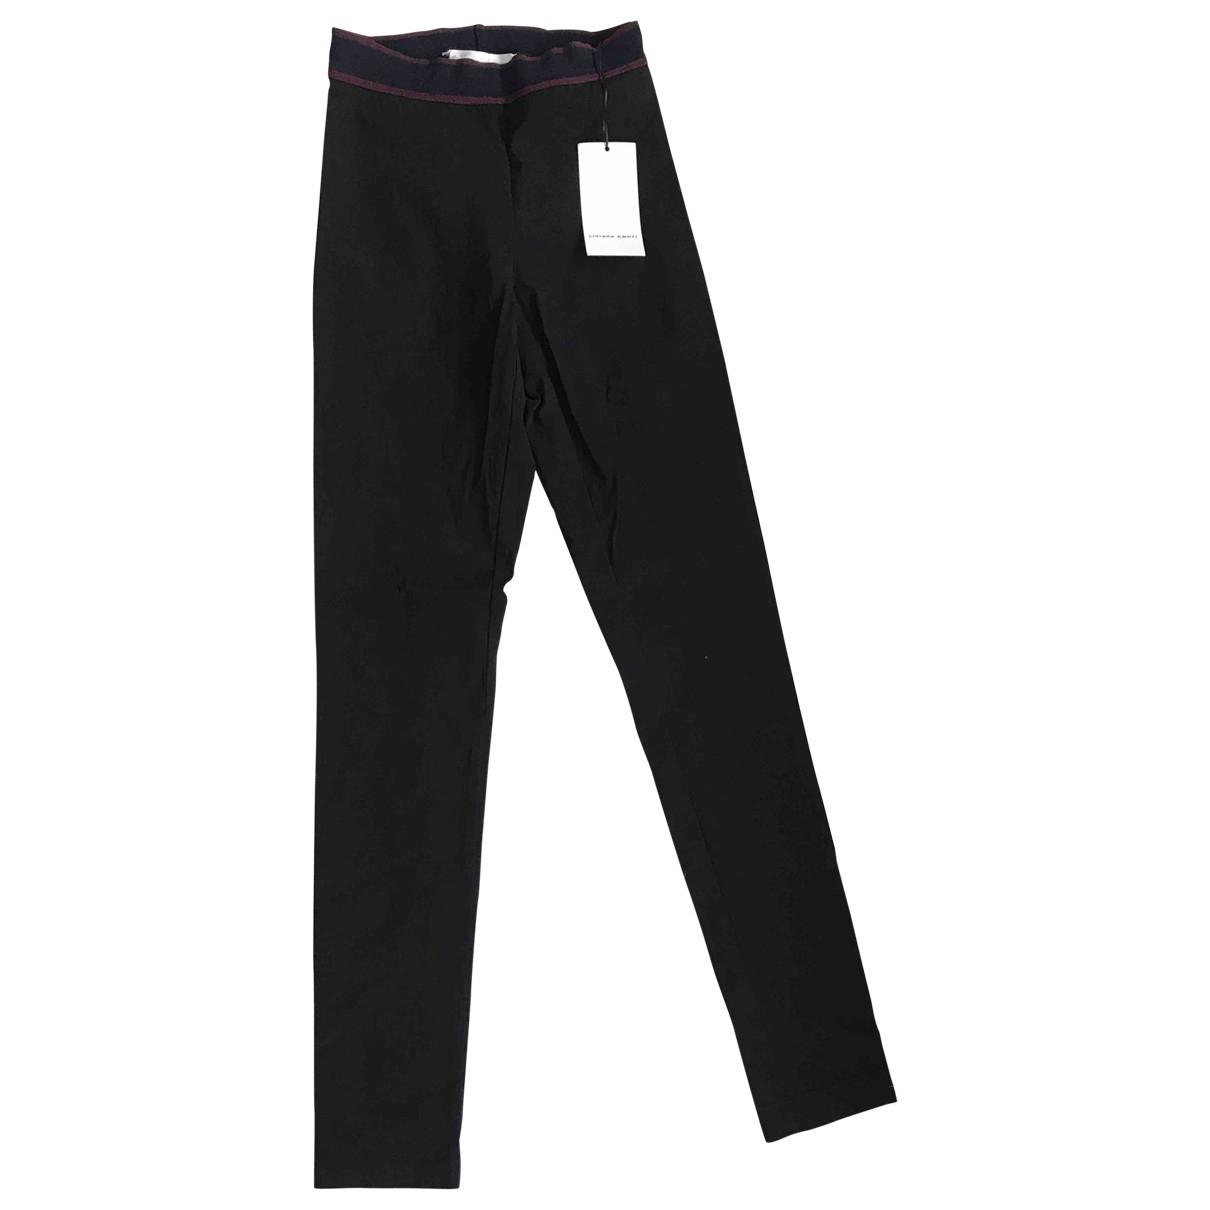 Liviana Conti \N Black Trousers for Women 40 IT